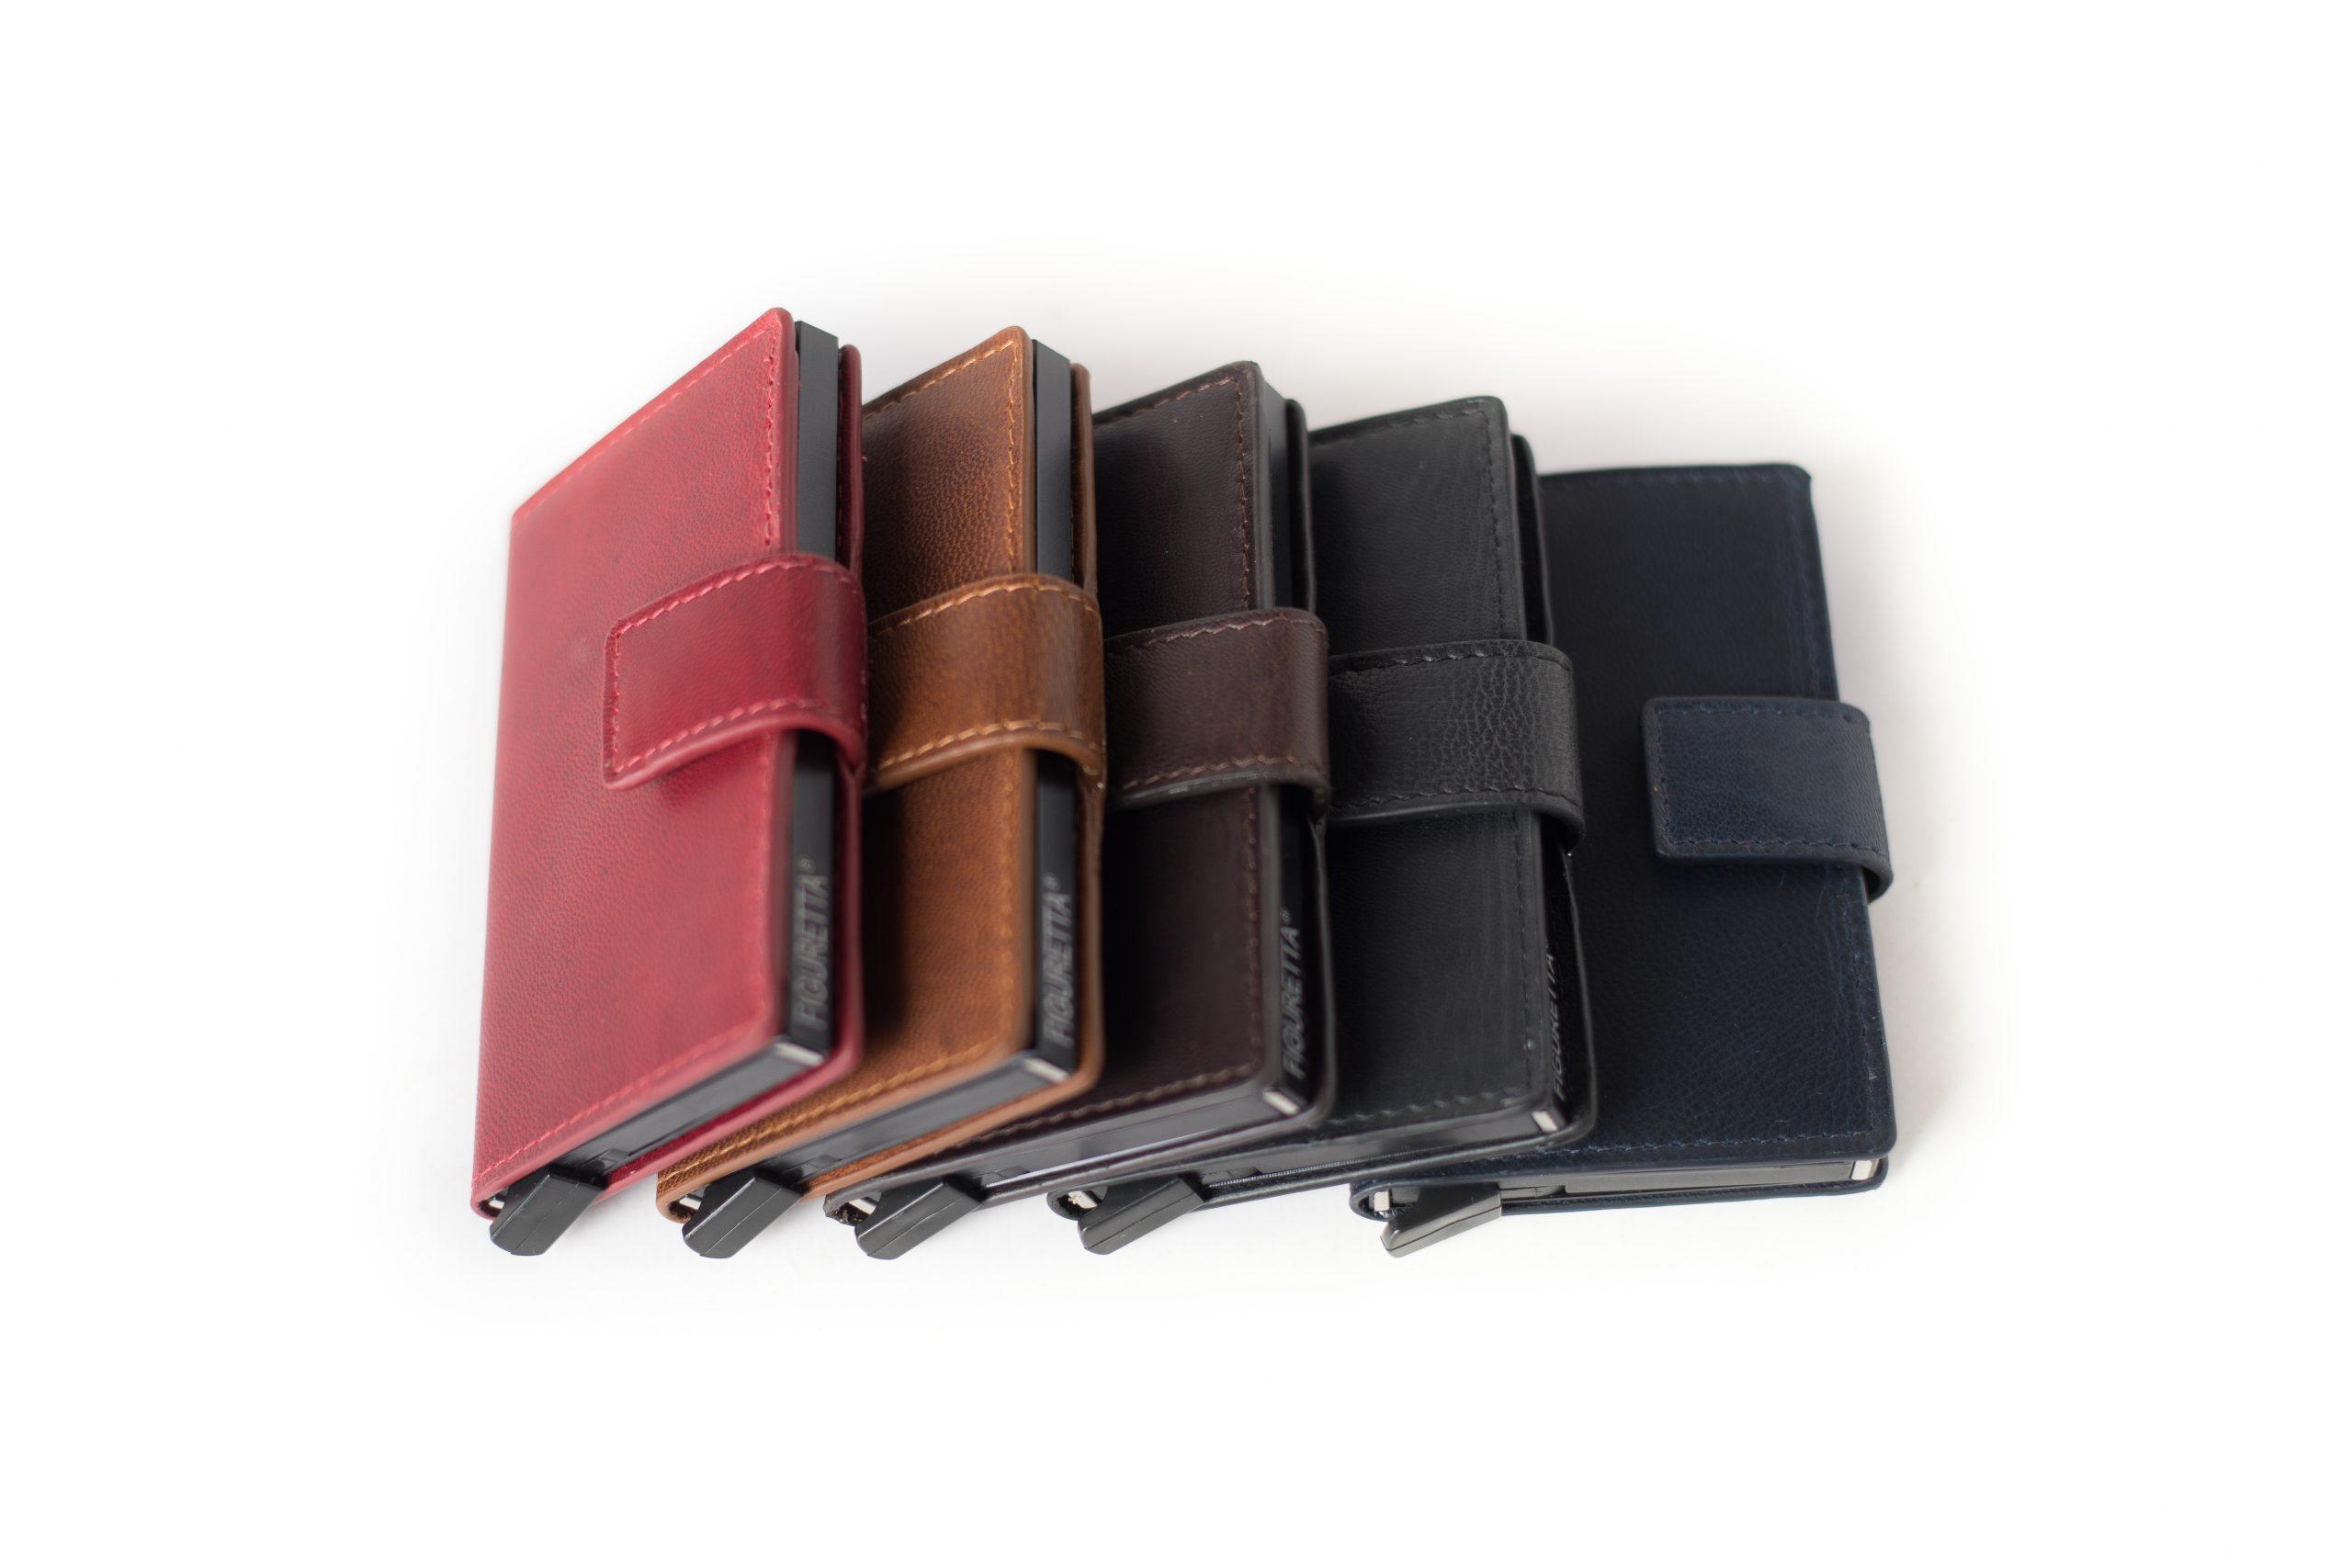 Figuretta RFID Compacte Luxury Leather Goat VT Cardprotectors